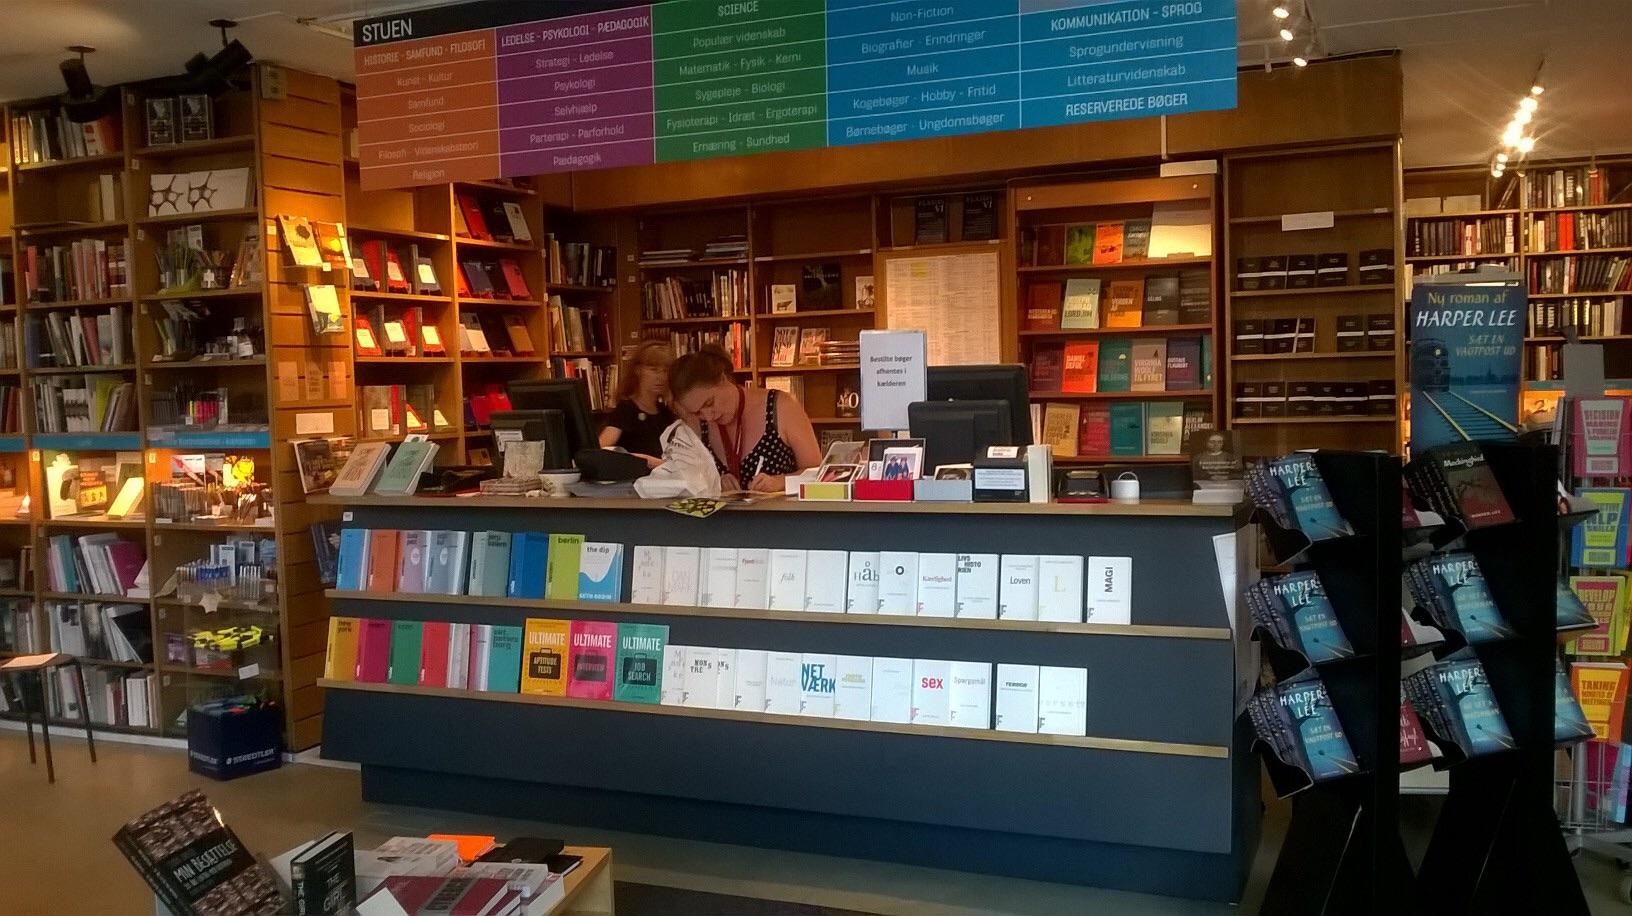 atheneum boghandel - disken